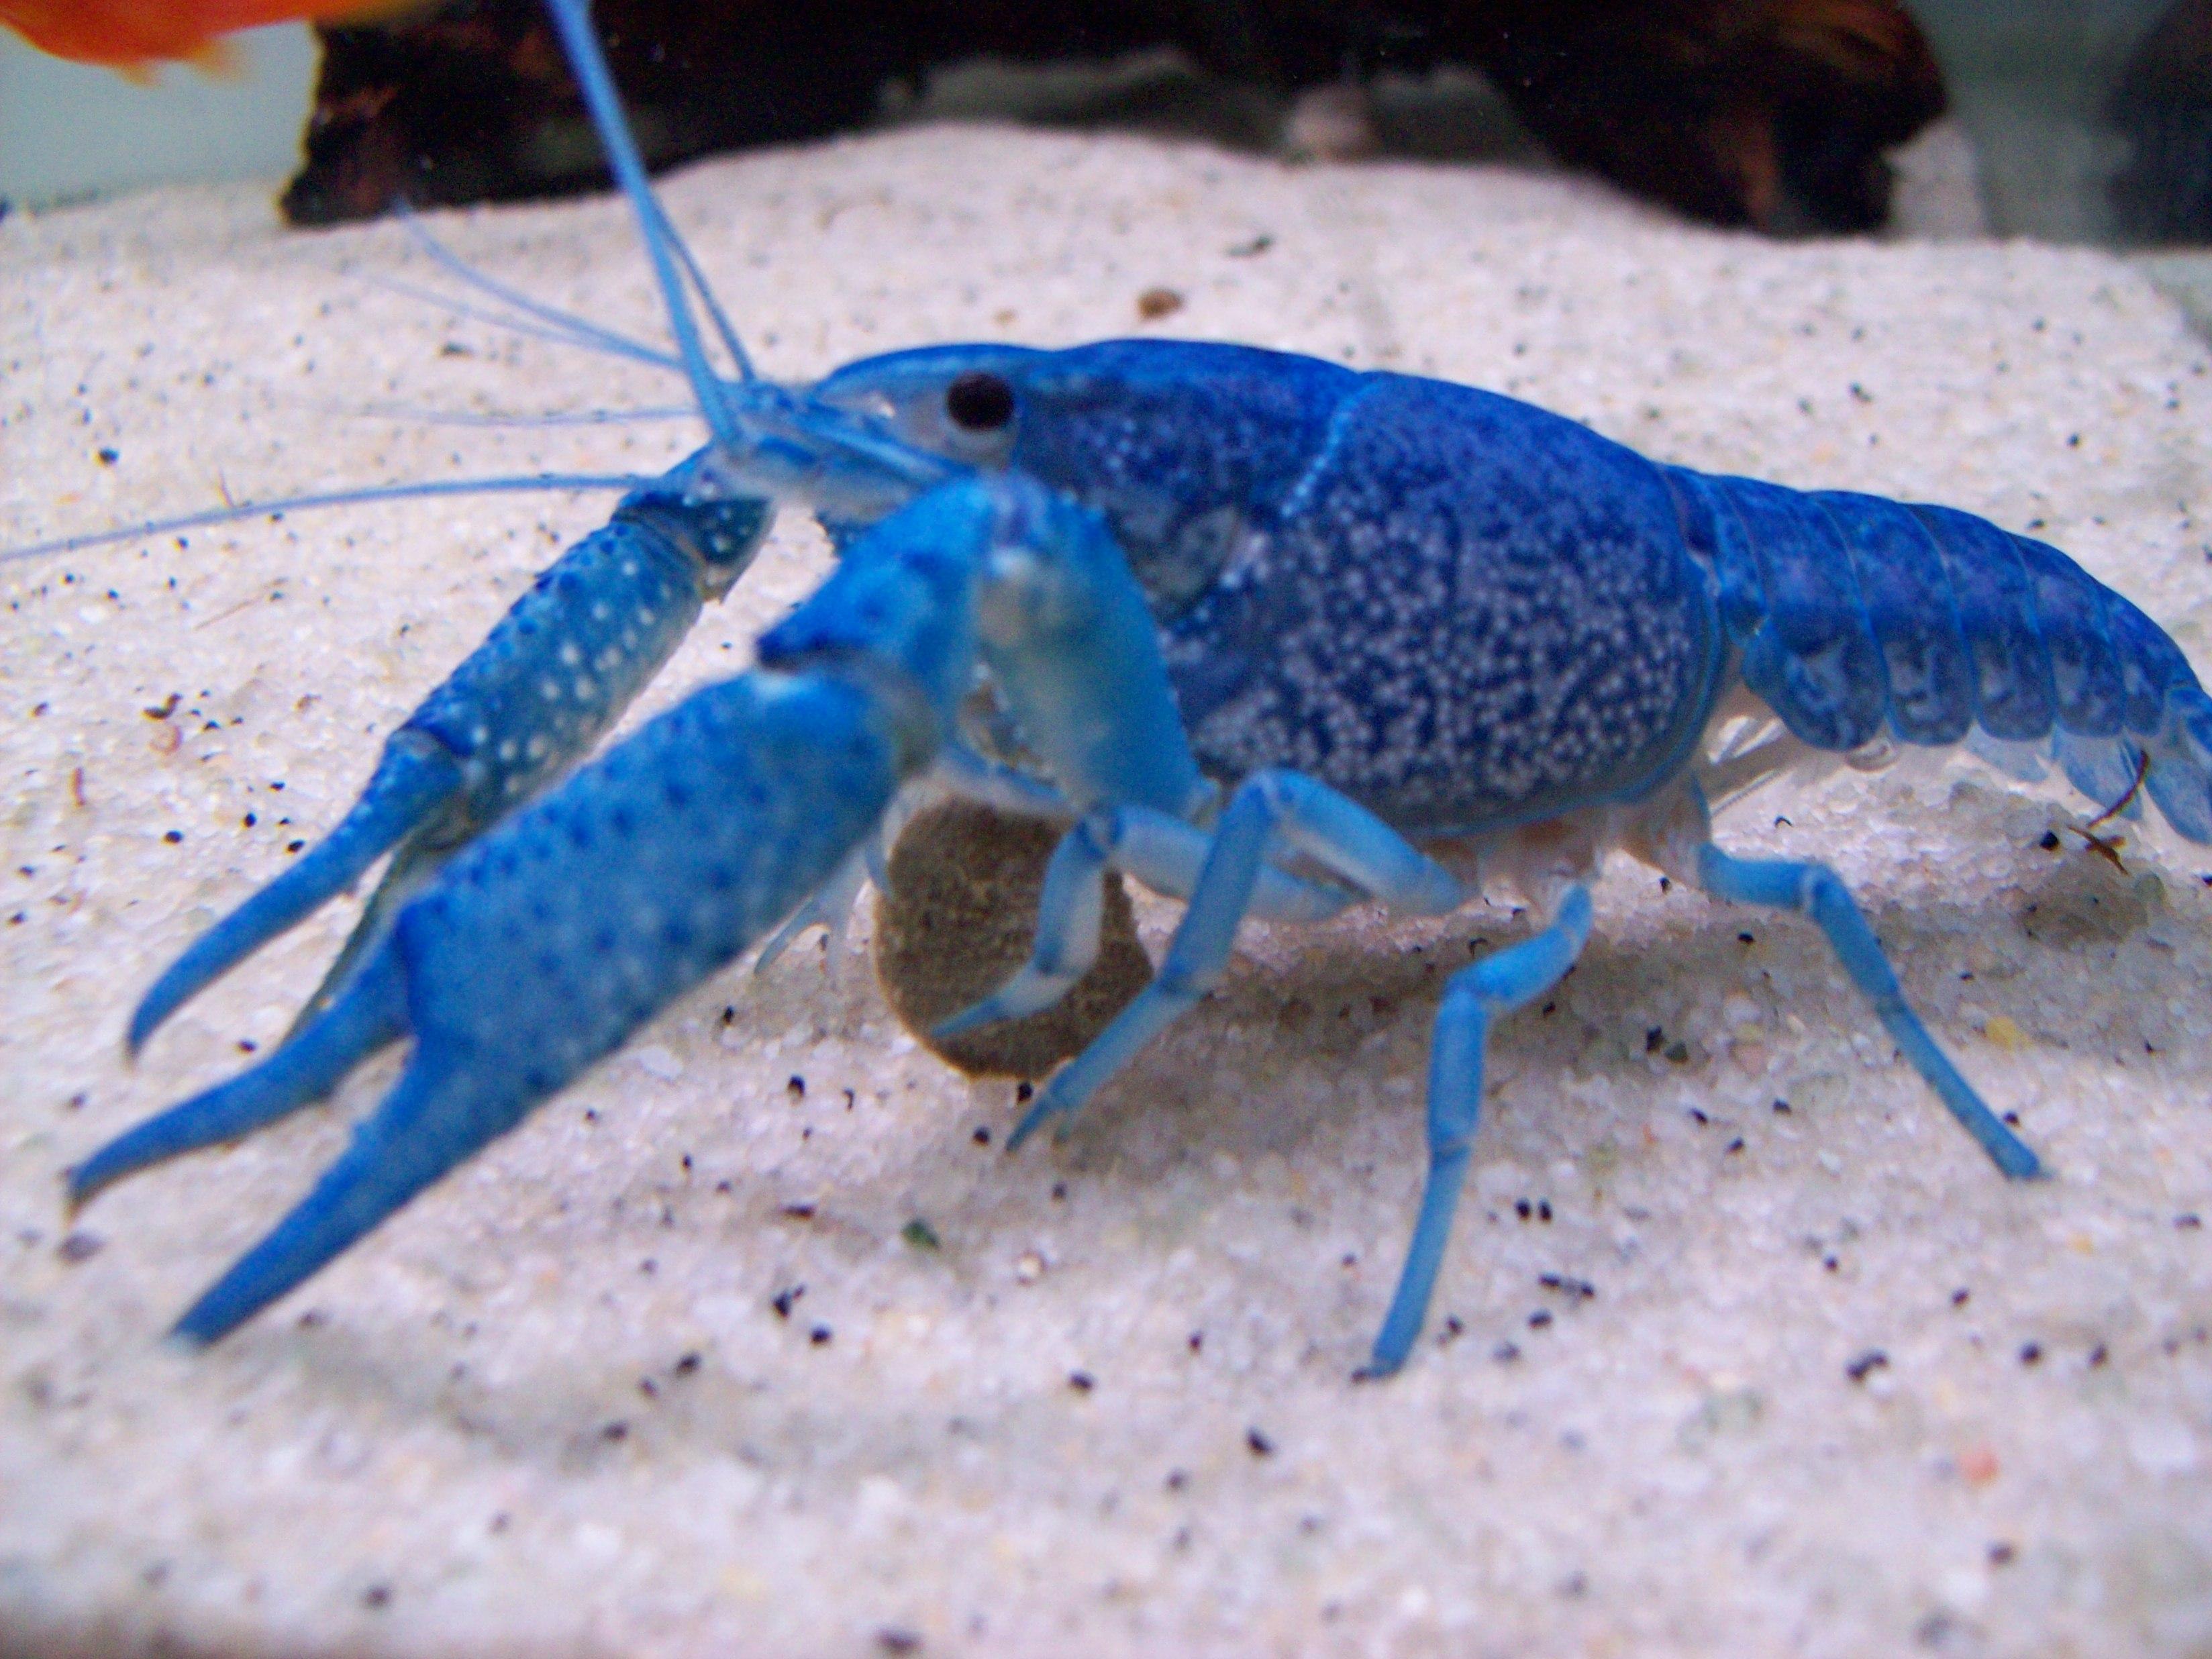 what do baby crayfish eat